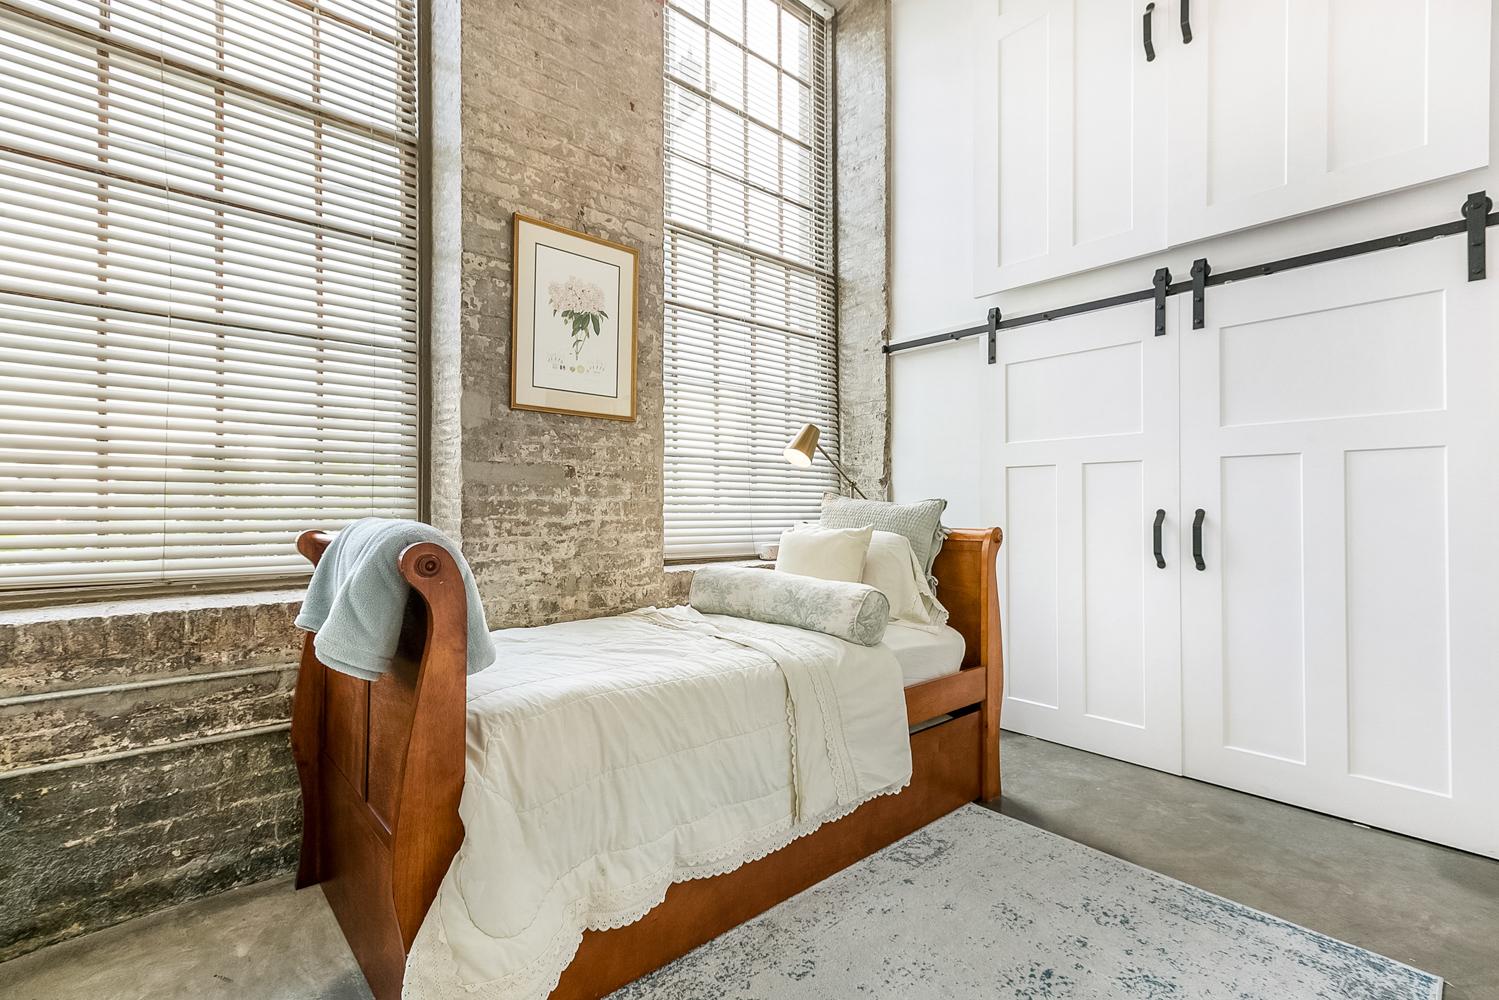 CBD/Warehouse District/South Market, Condo, 2 beds, 2.0 baths, $3600 per month New Orleans Rental - devie image_8